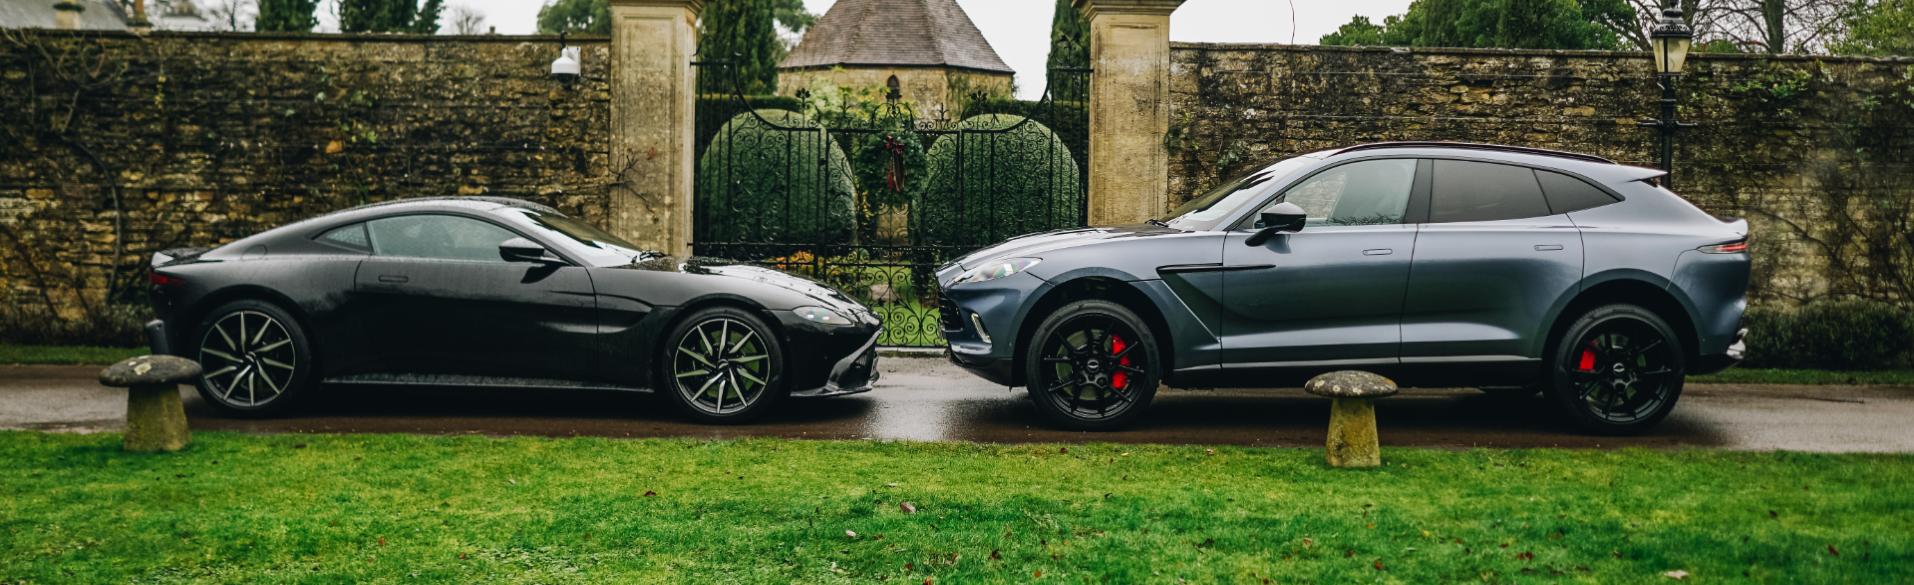 Aston Martin Vantage And DBX